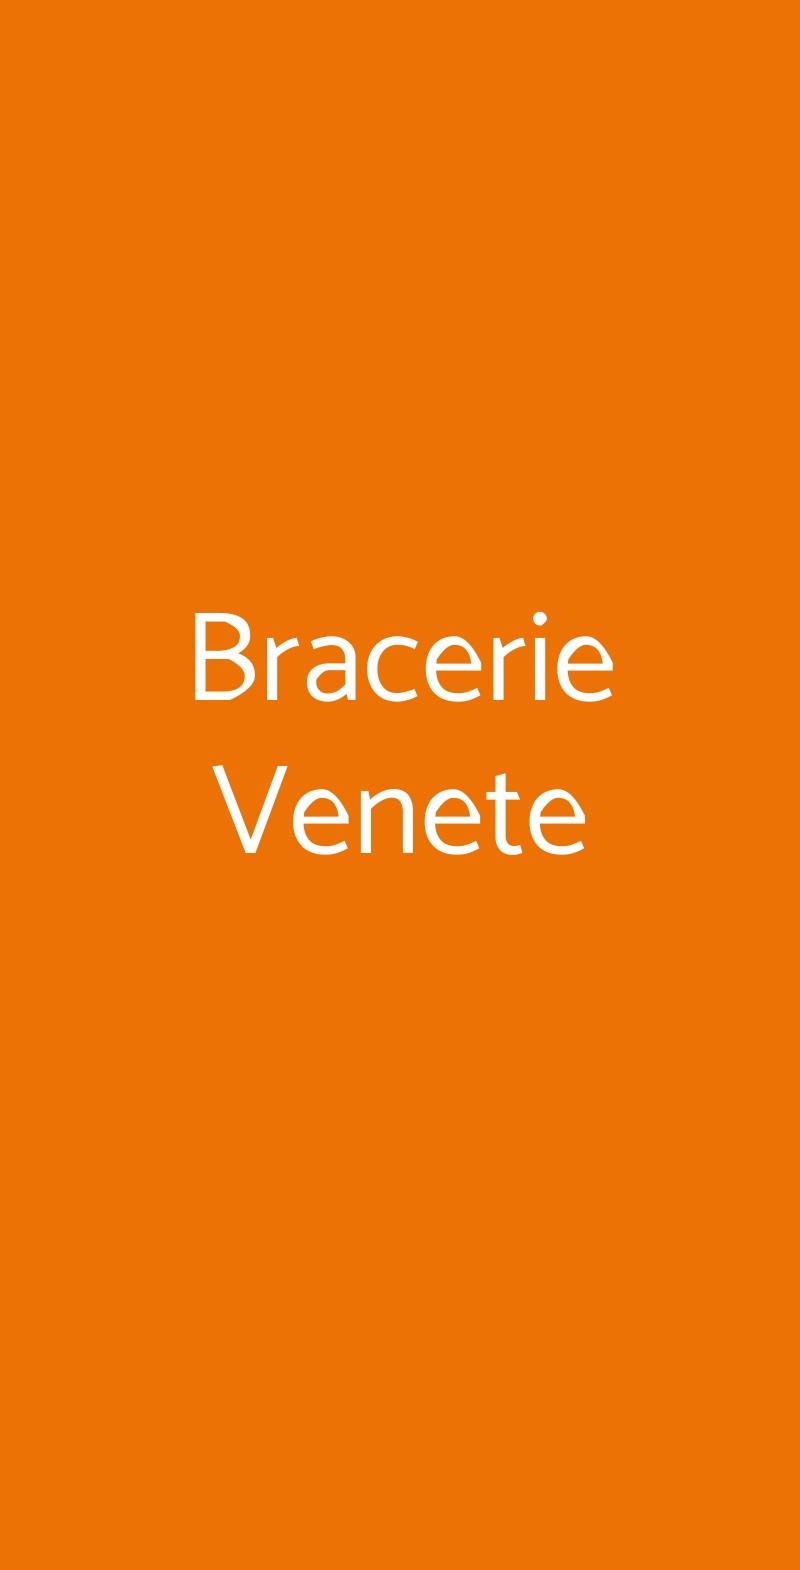 Bracerie Venete Trieste menù 1 pagina